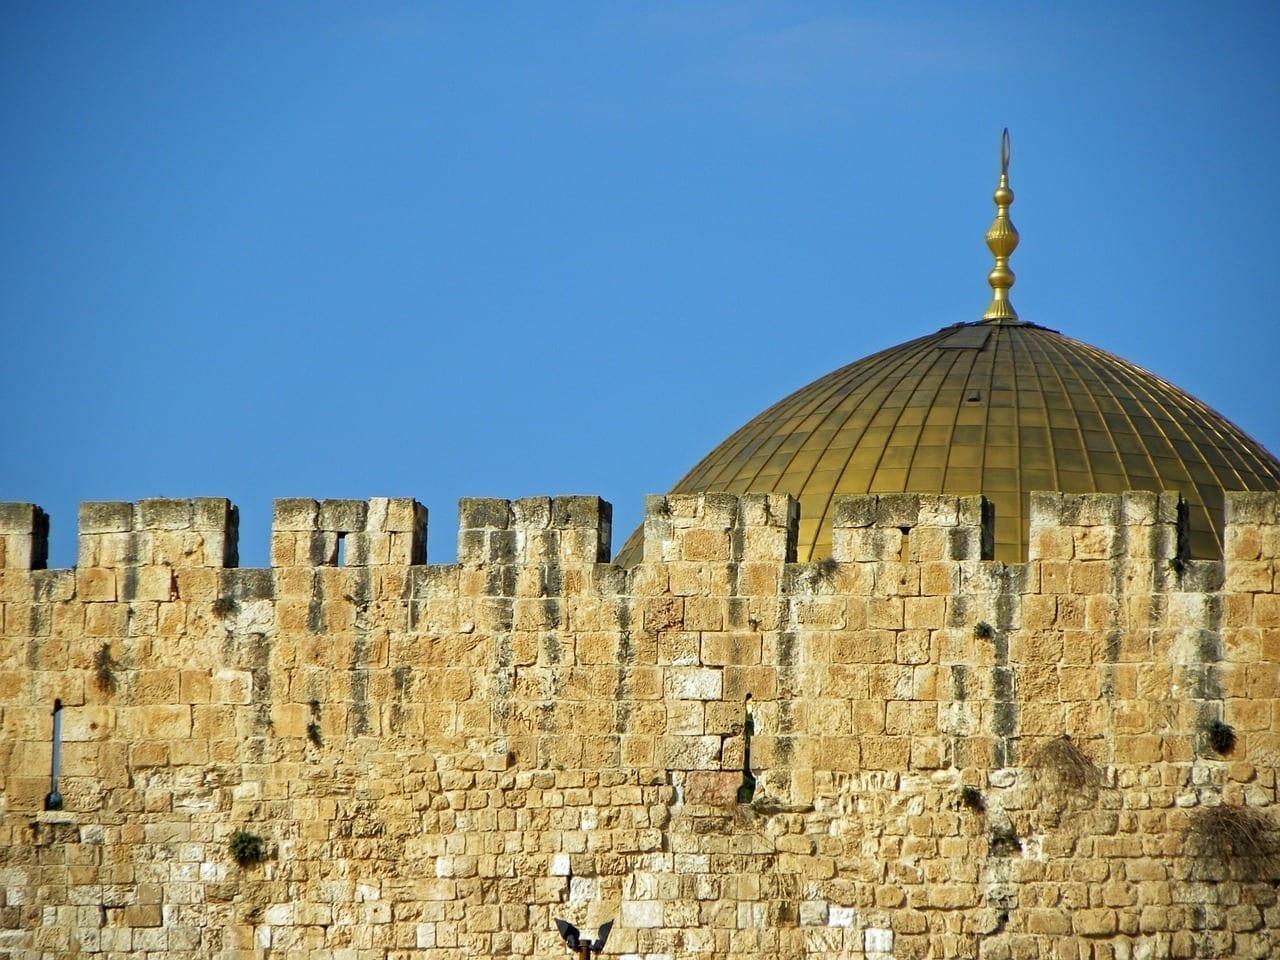 Cúpula De La Roca Jerusalén Israel